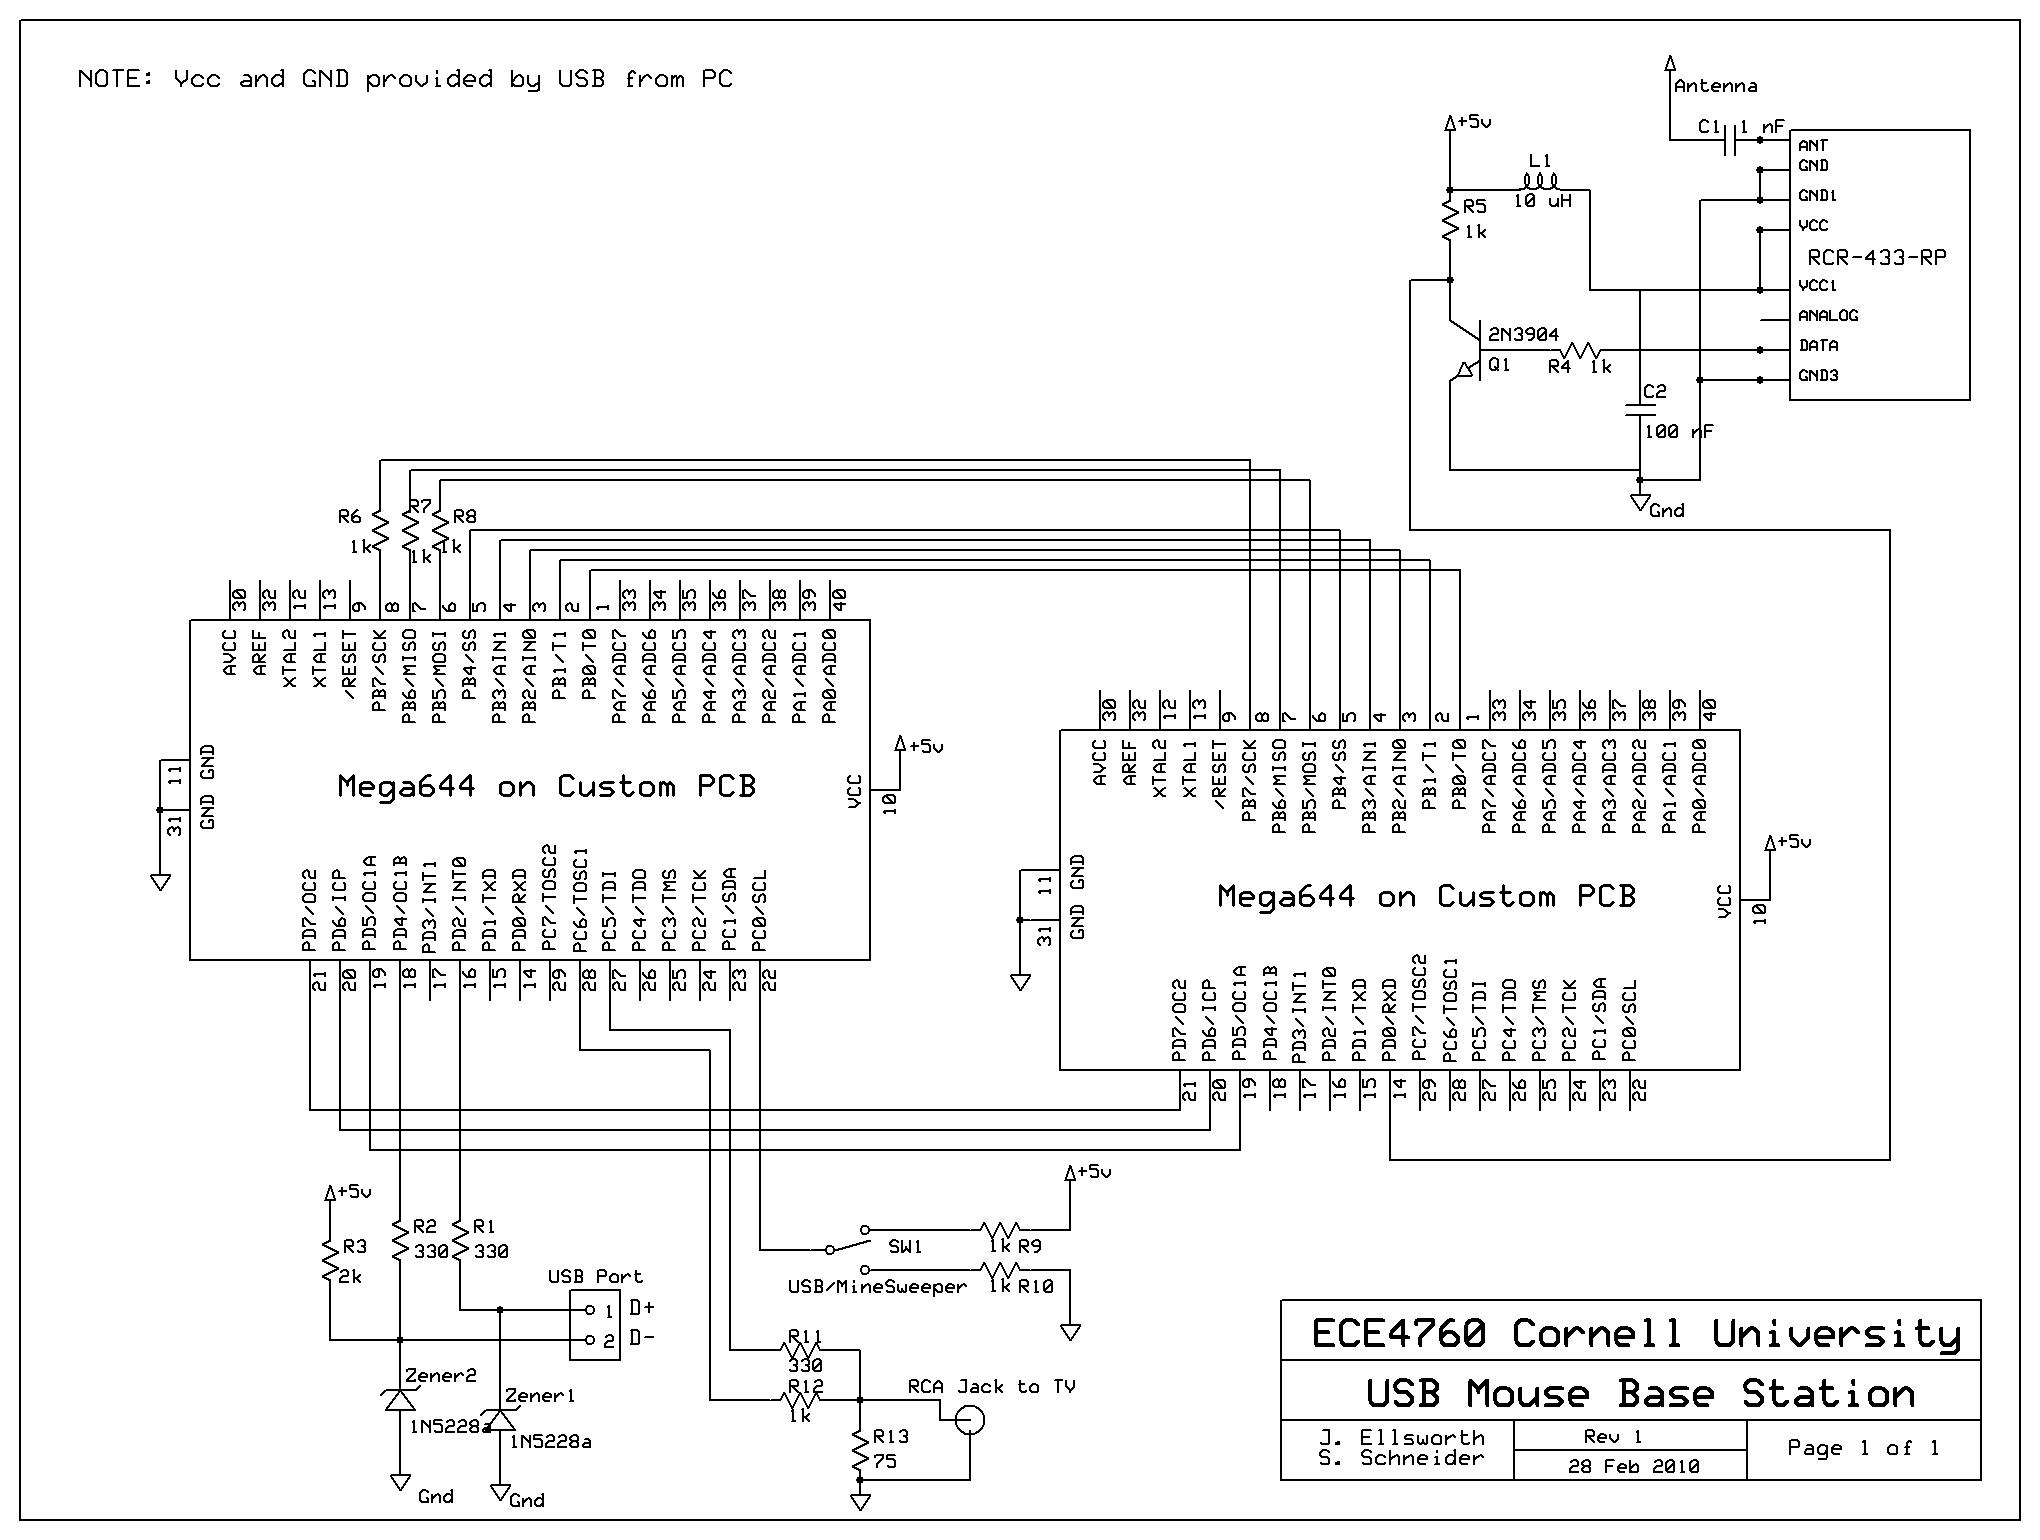 Computer Mouse Schematic Diagram